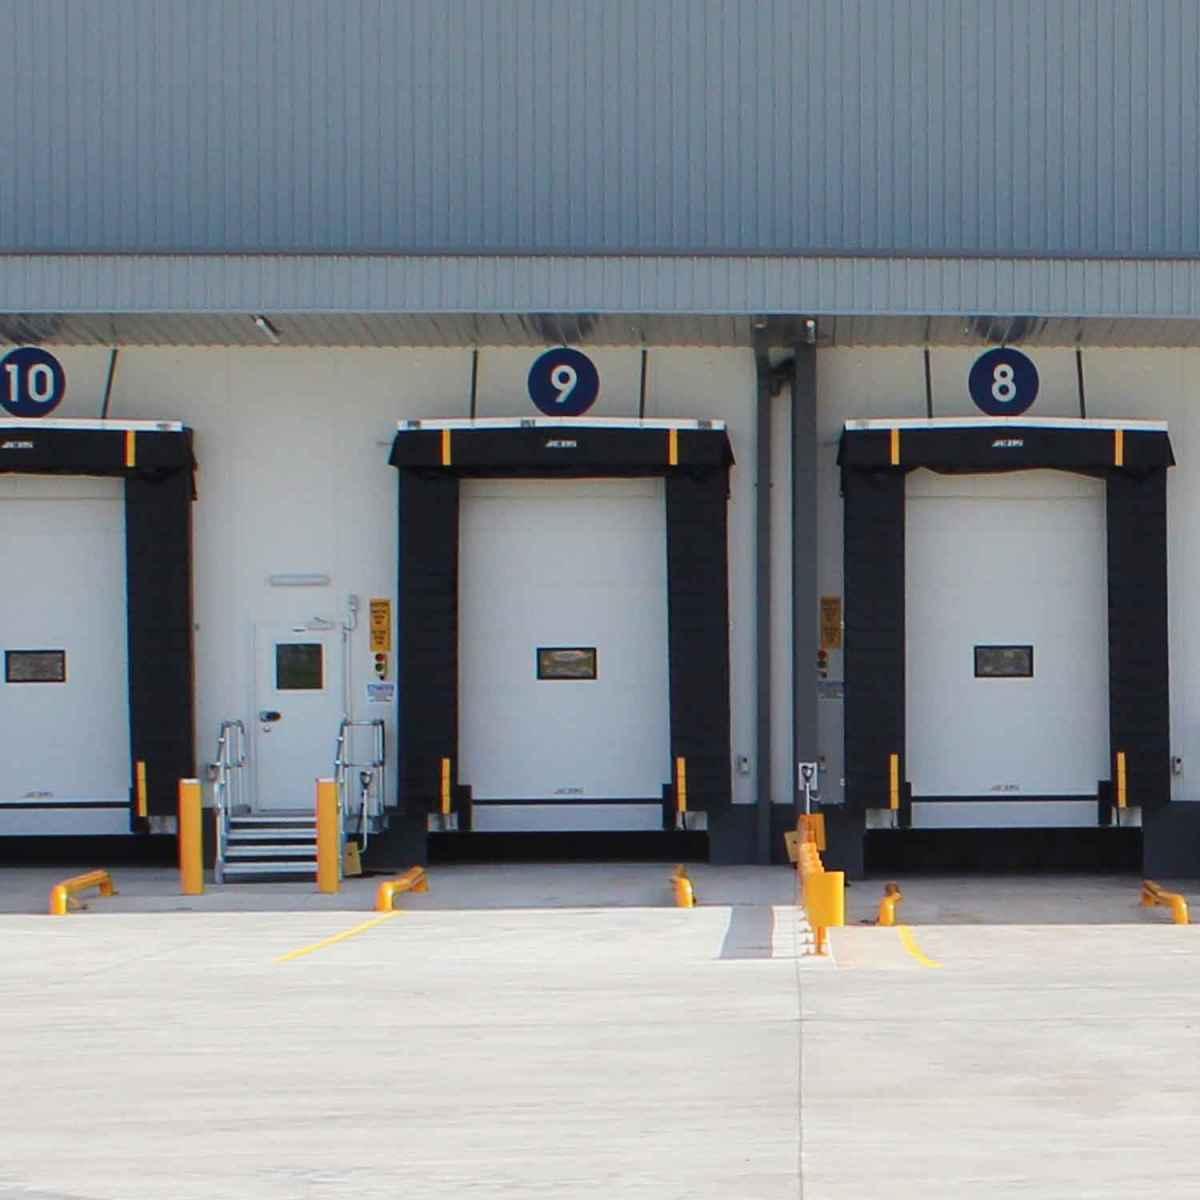 Nordock Weartough Loading Dock Shelter model FFI-750